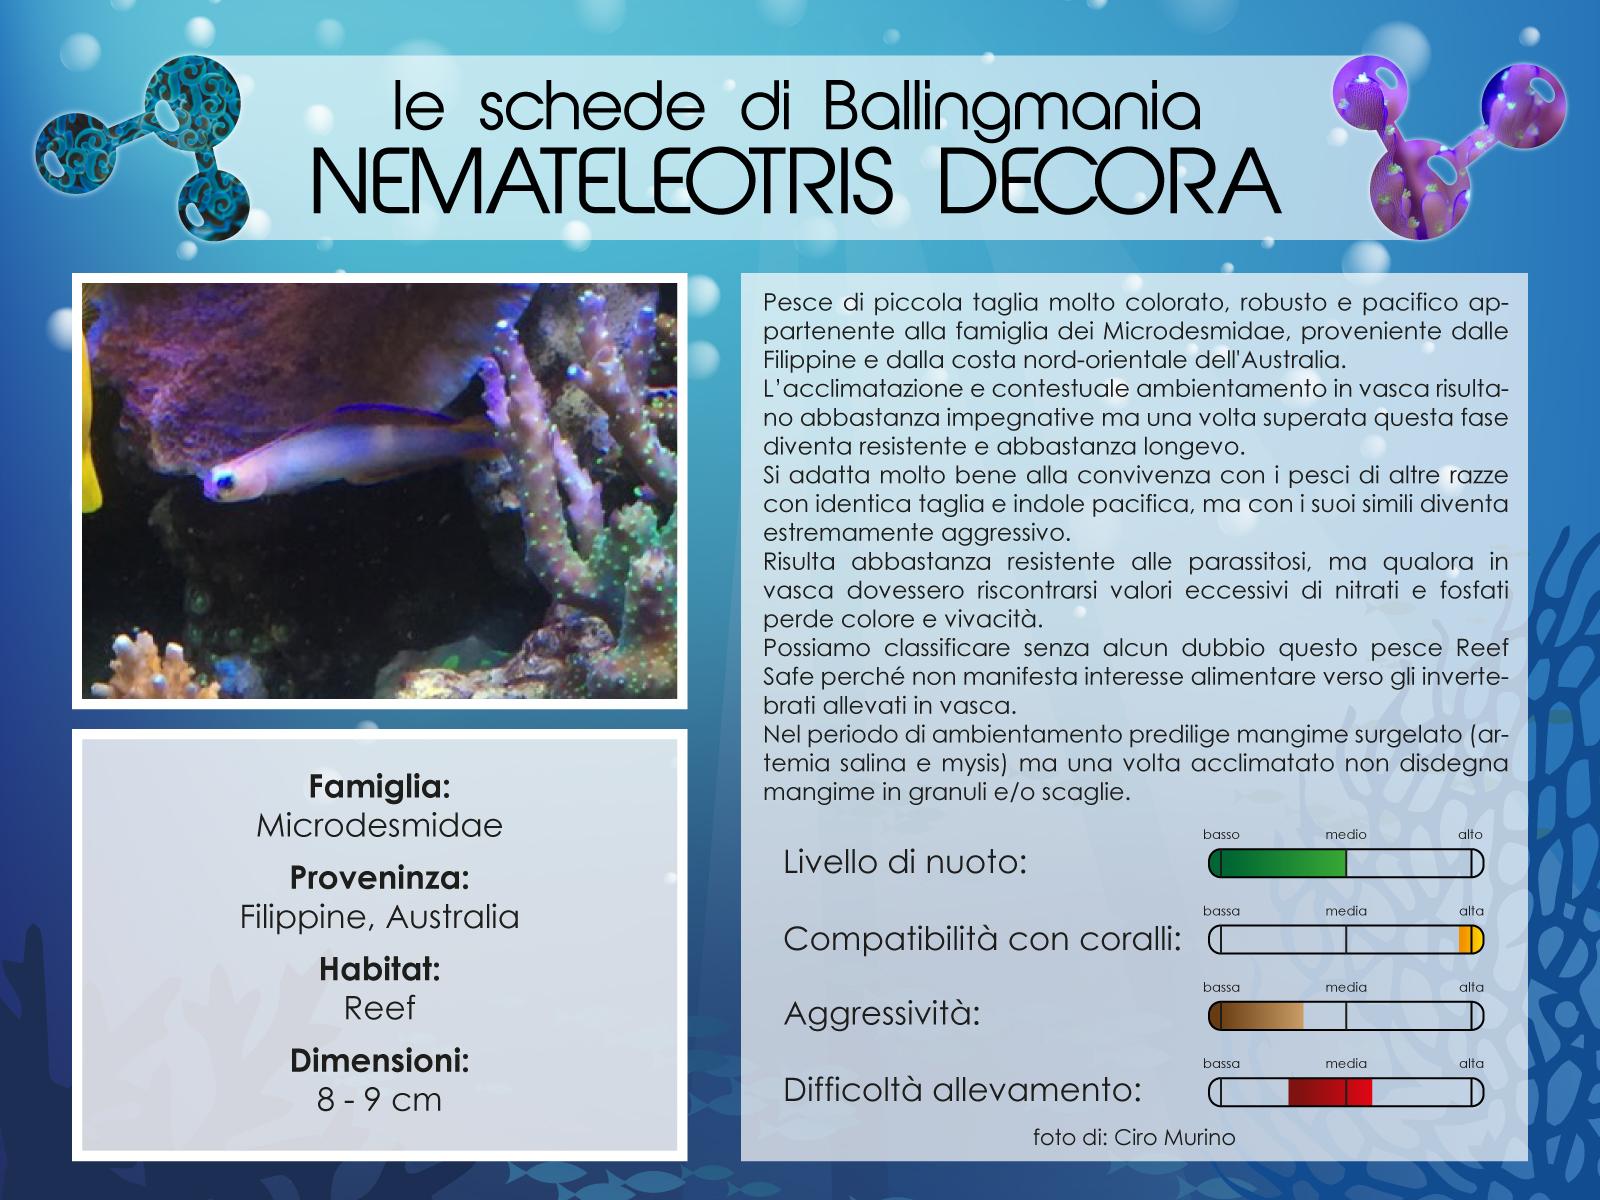 Nemateleotris Decora